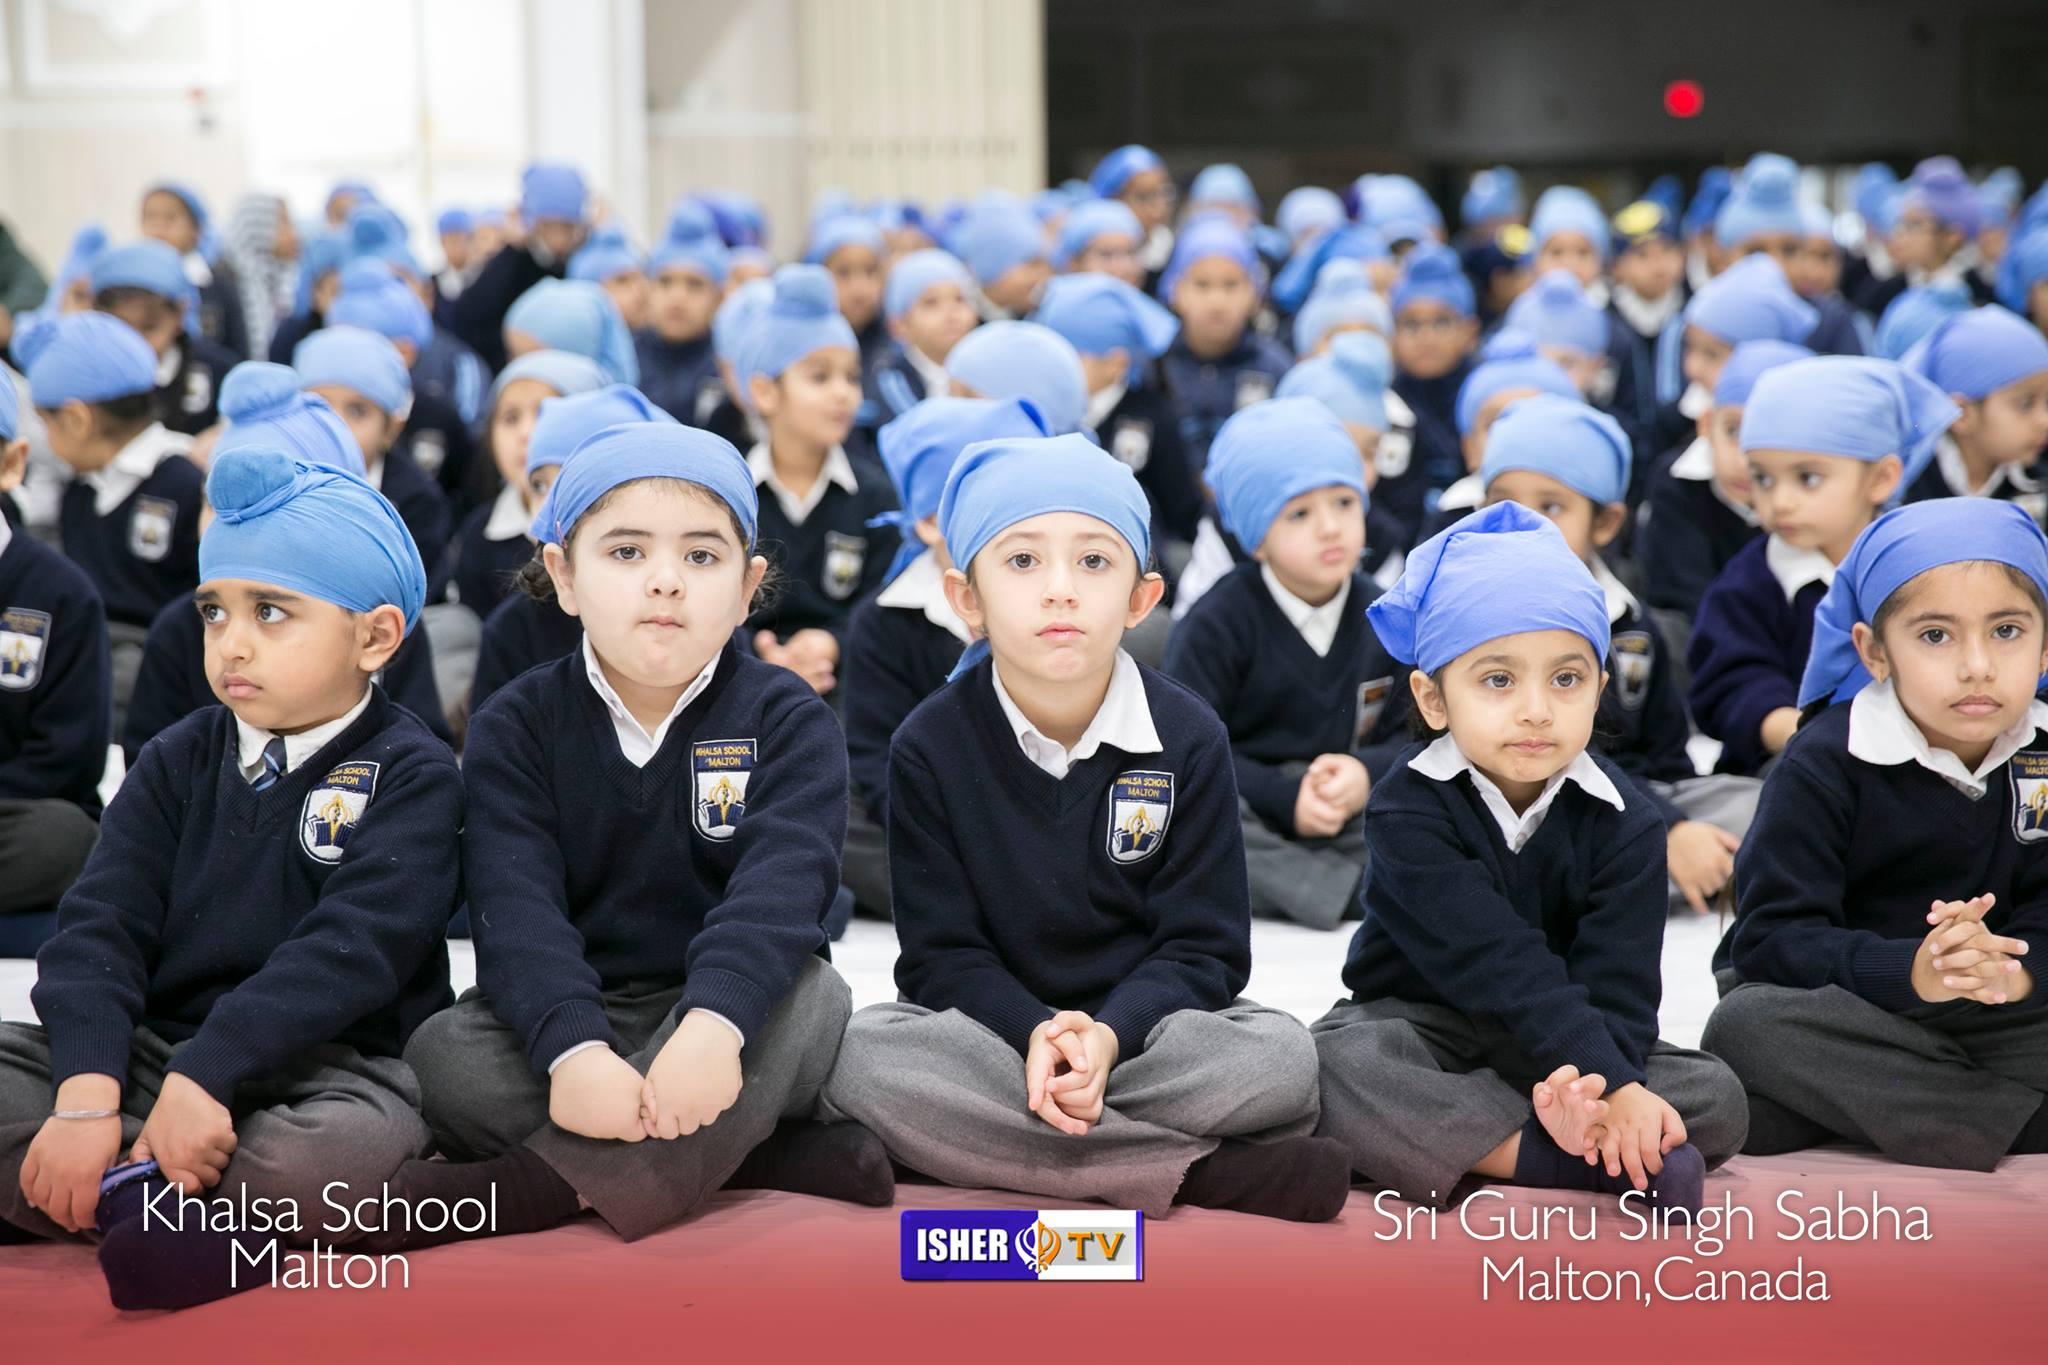 Khalsa School Malton